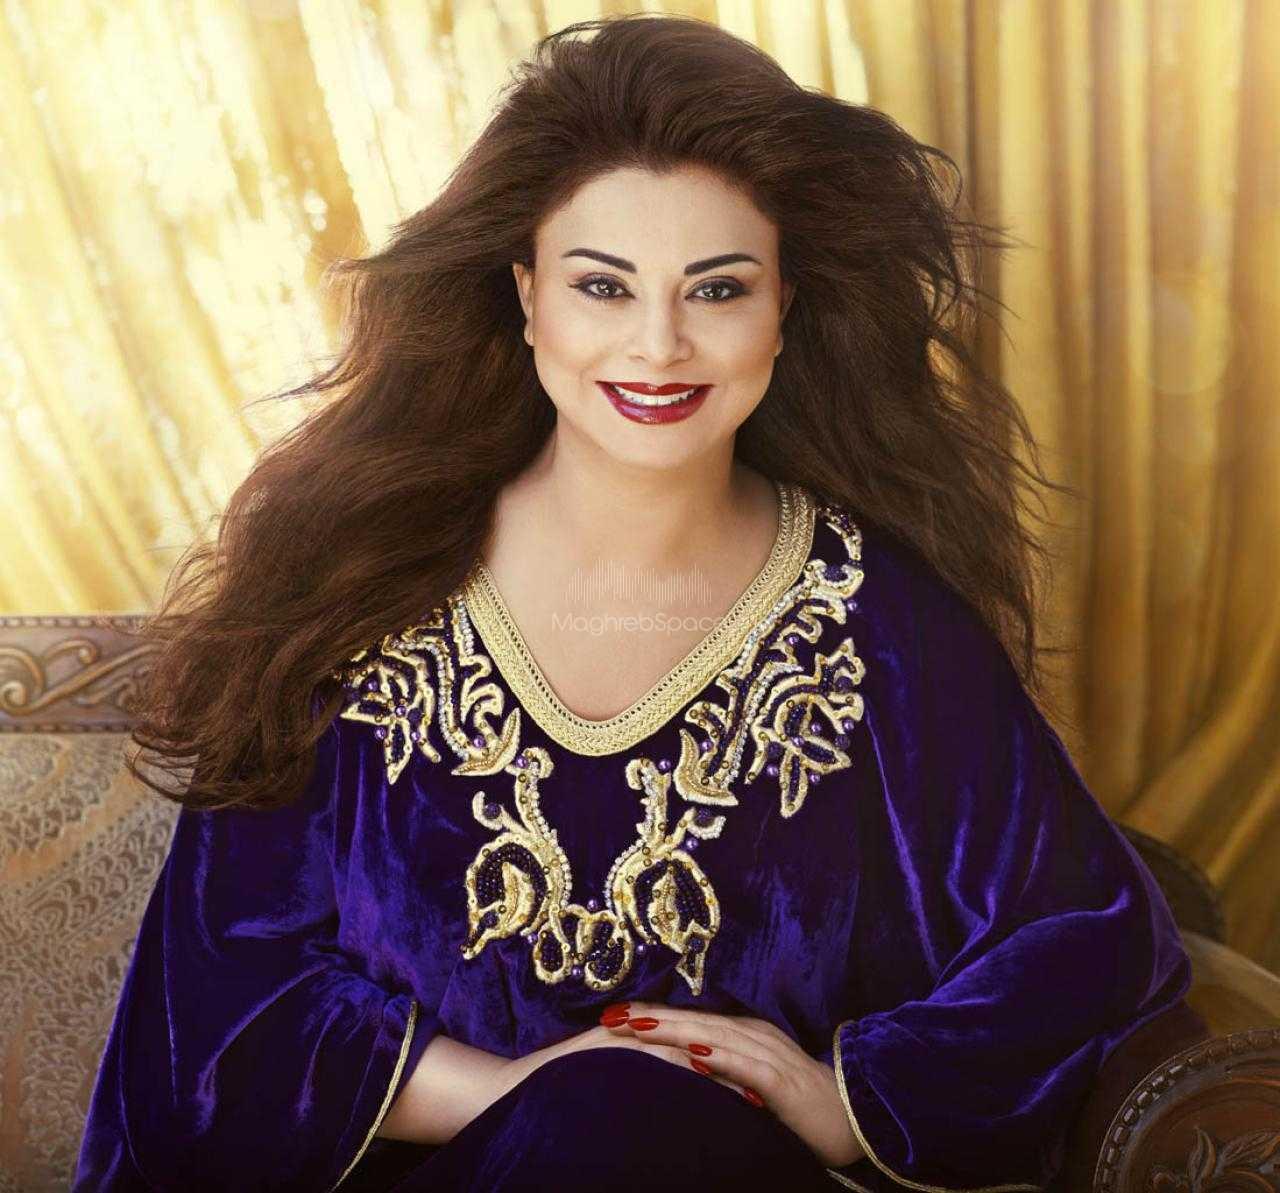 Latifa Raafat from Morocco | Popnable